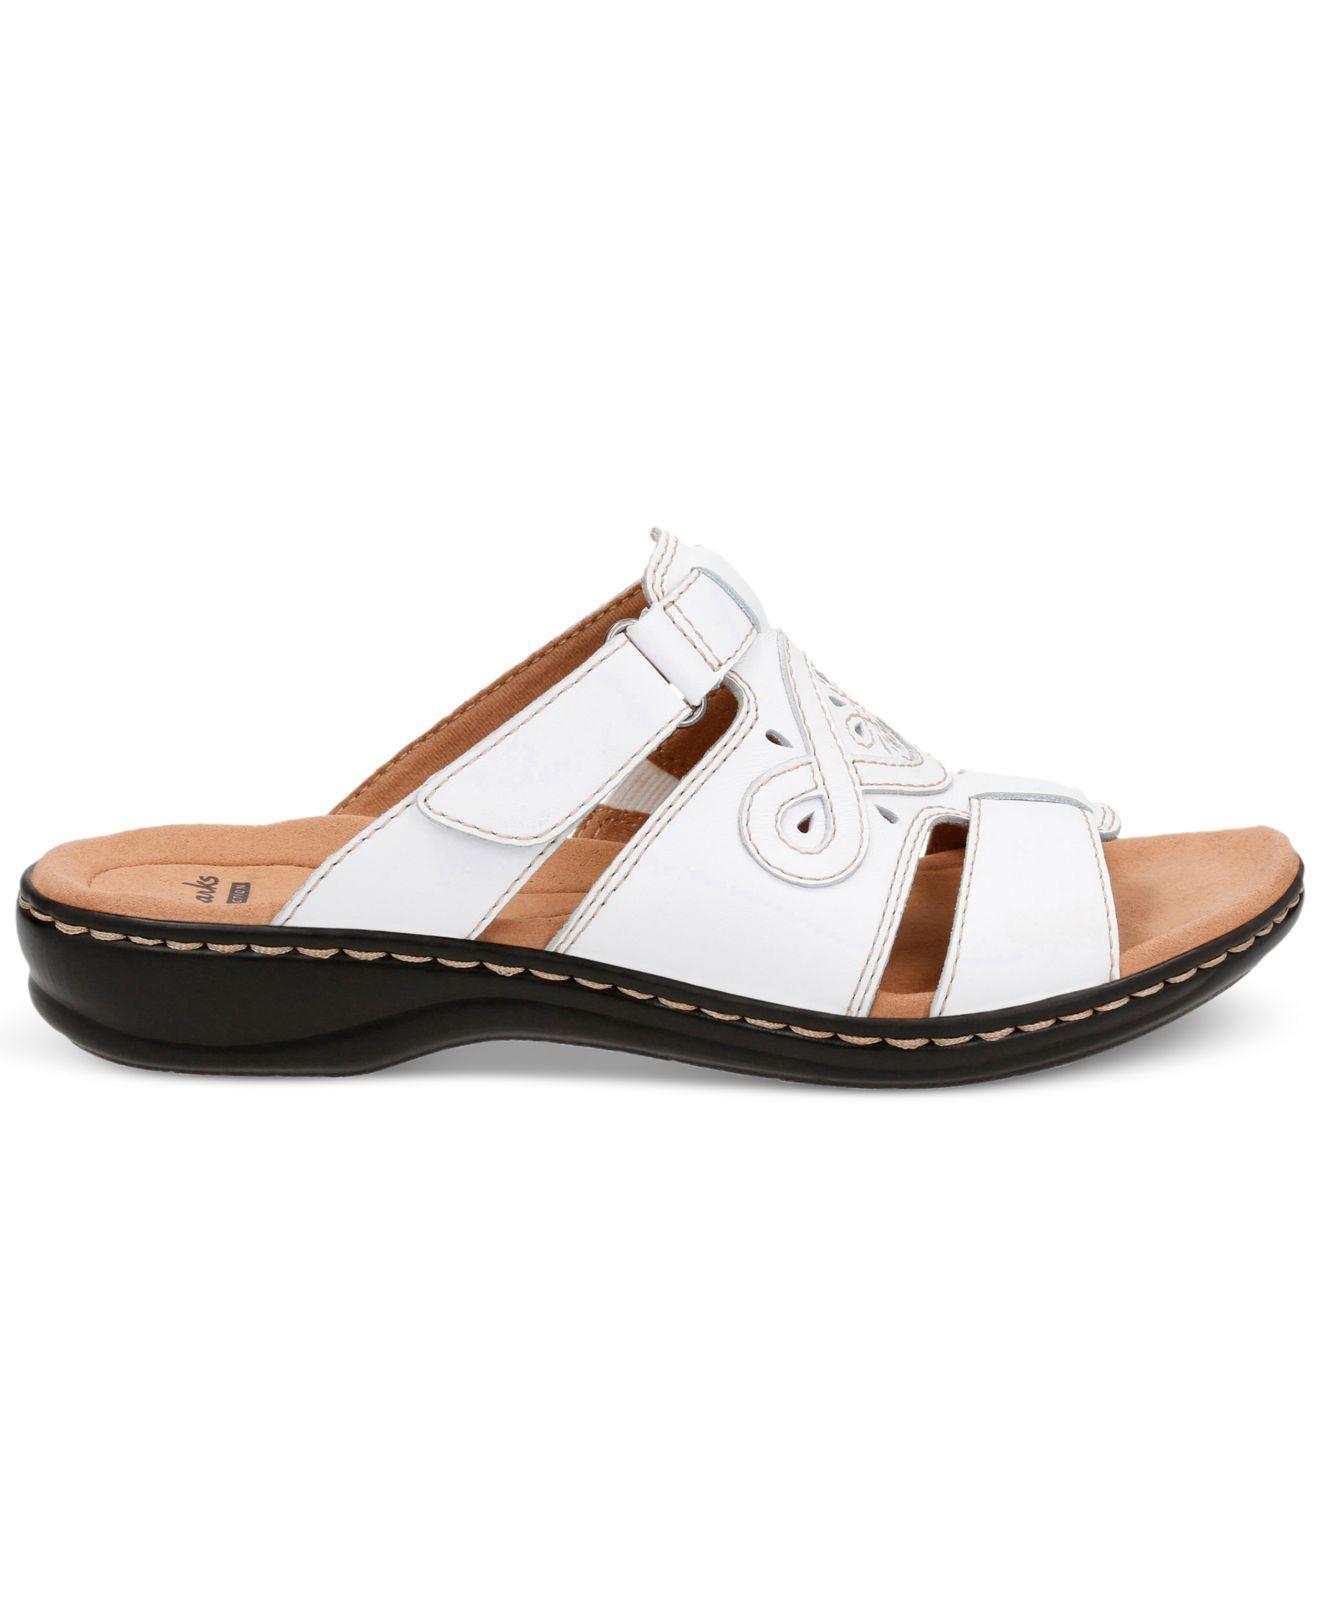 Lyst Clarks Women S Leisa Higley Flat Sandals In White